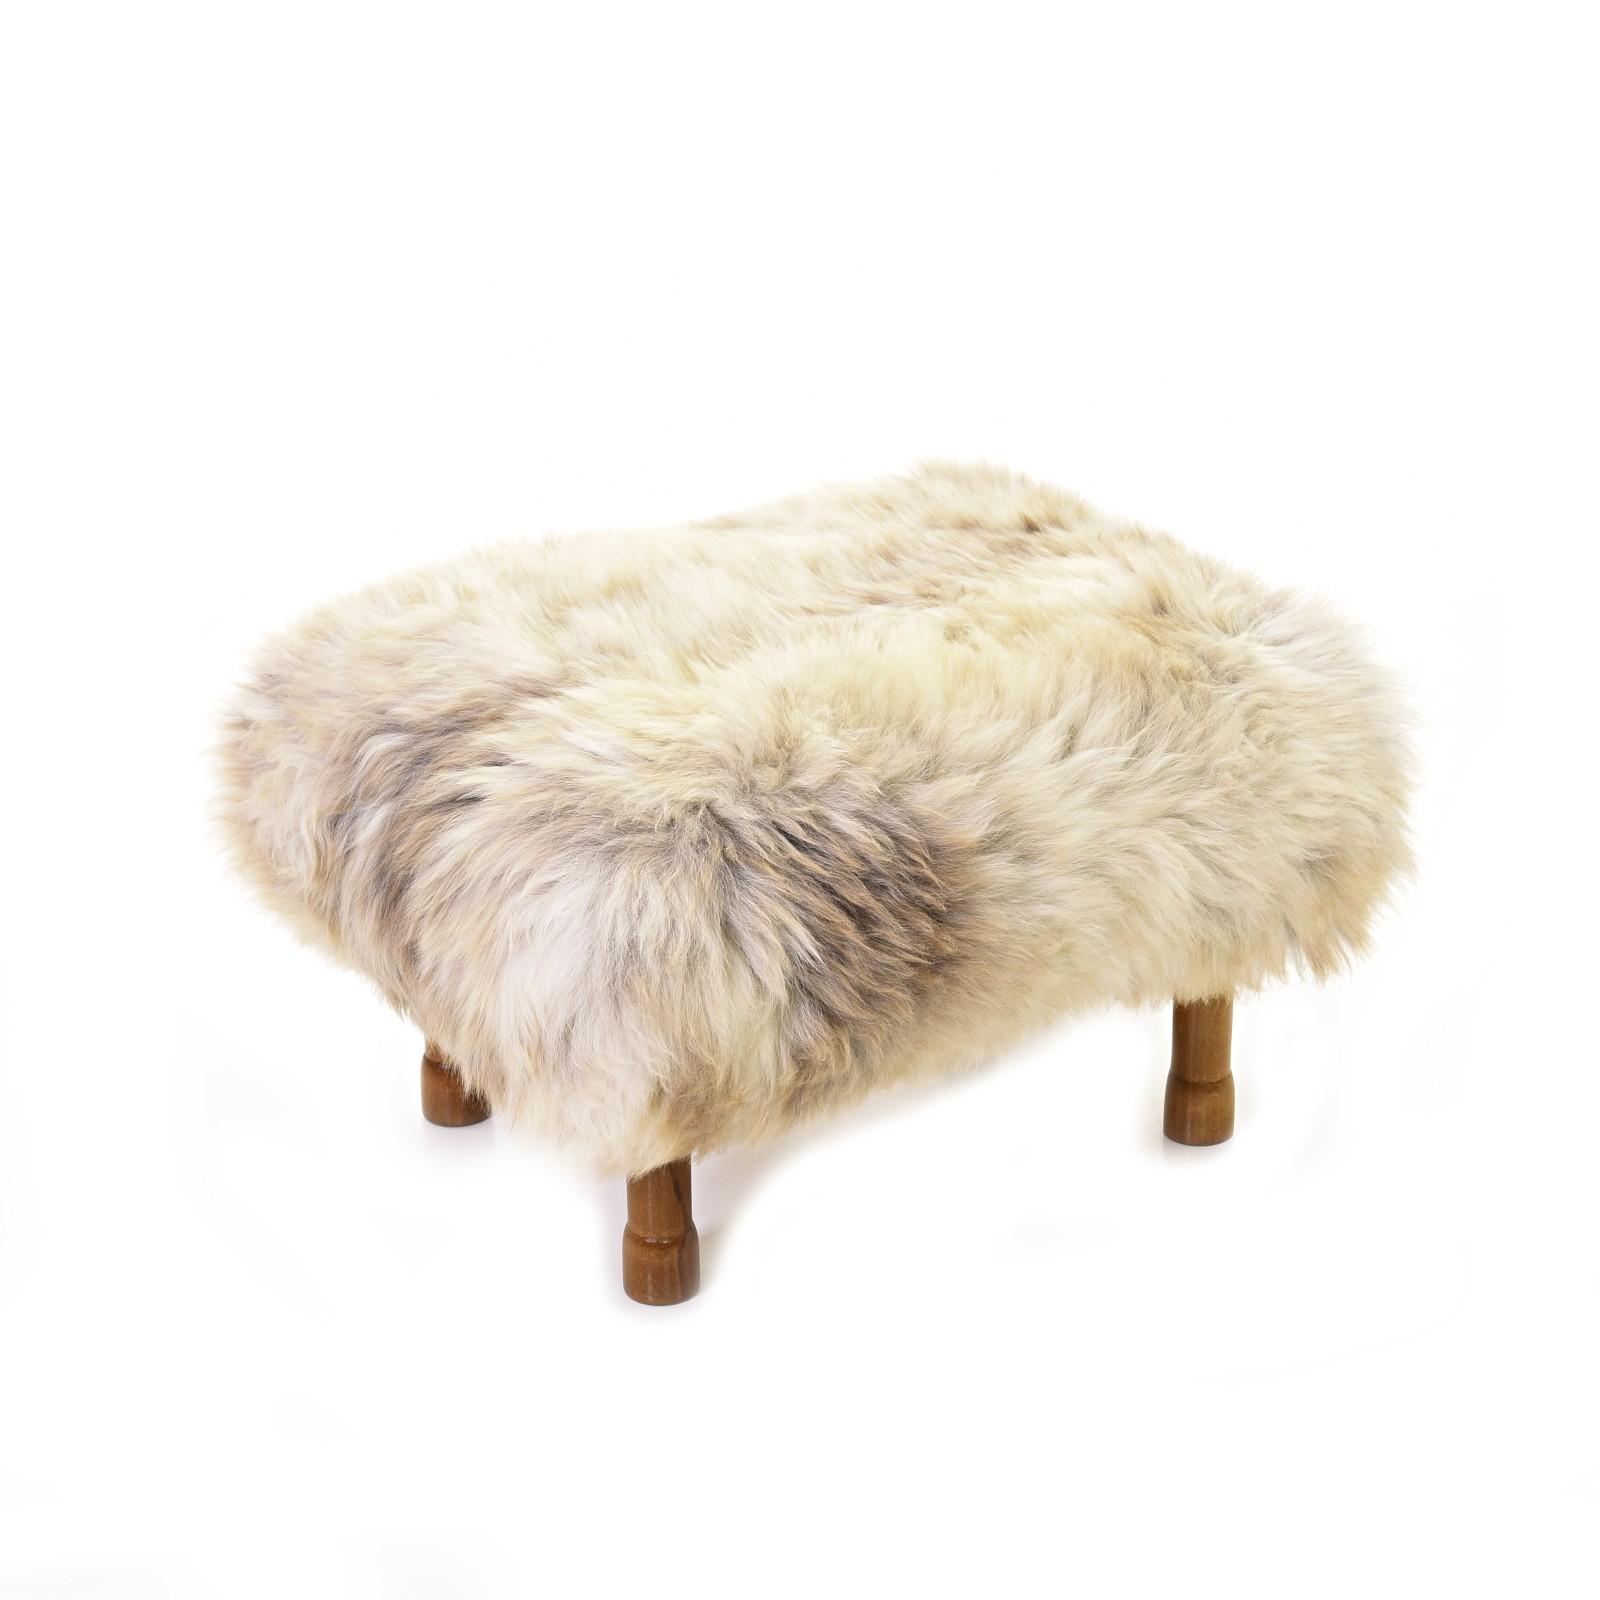 Delyth Sheepskin Footstool Rare Breed